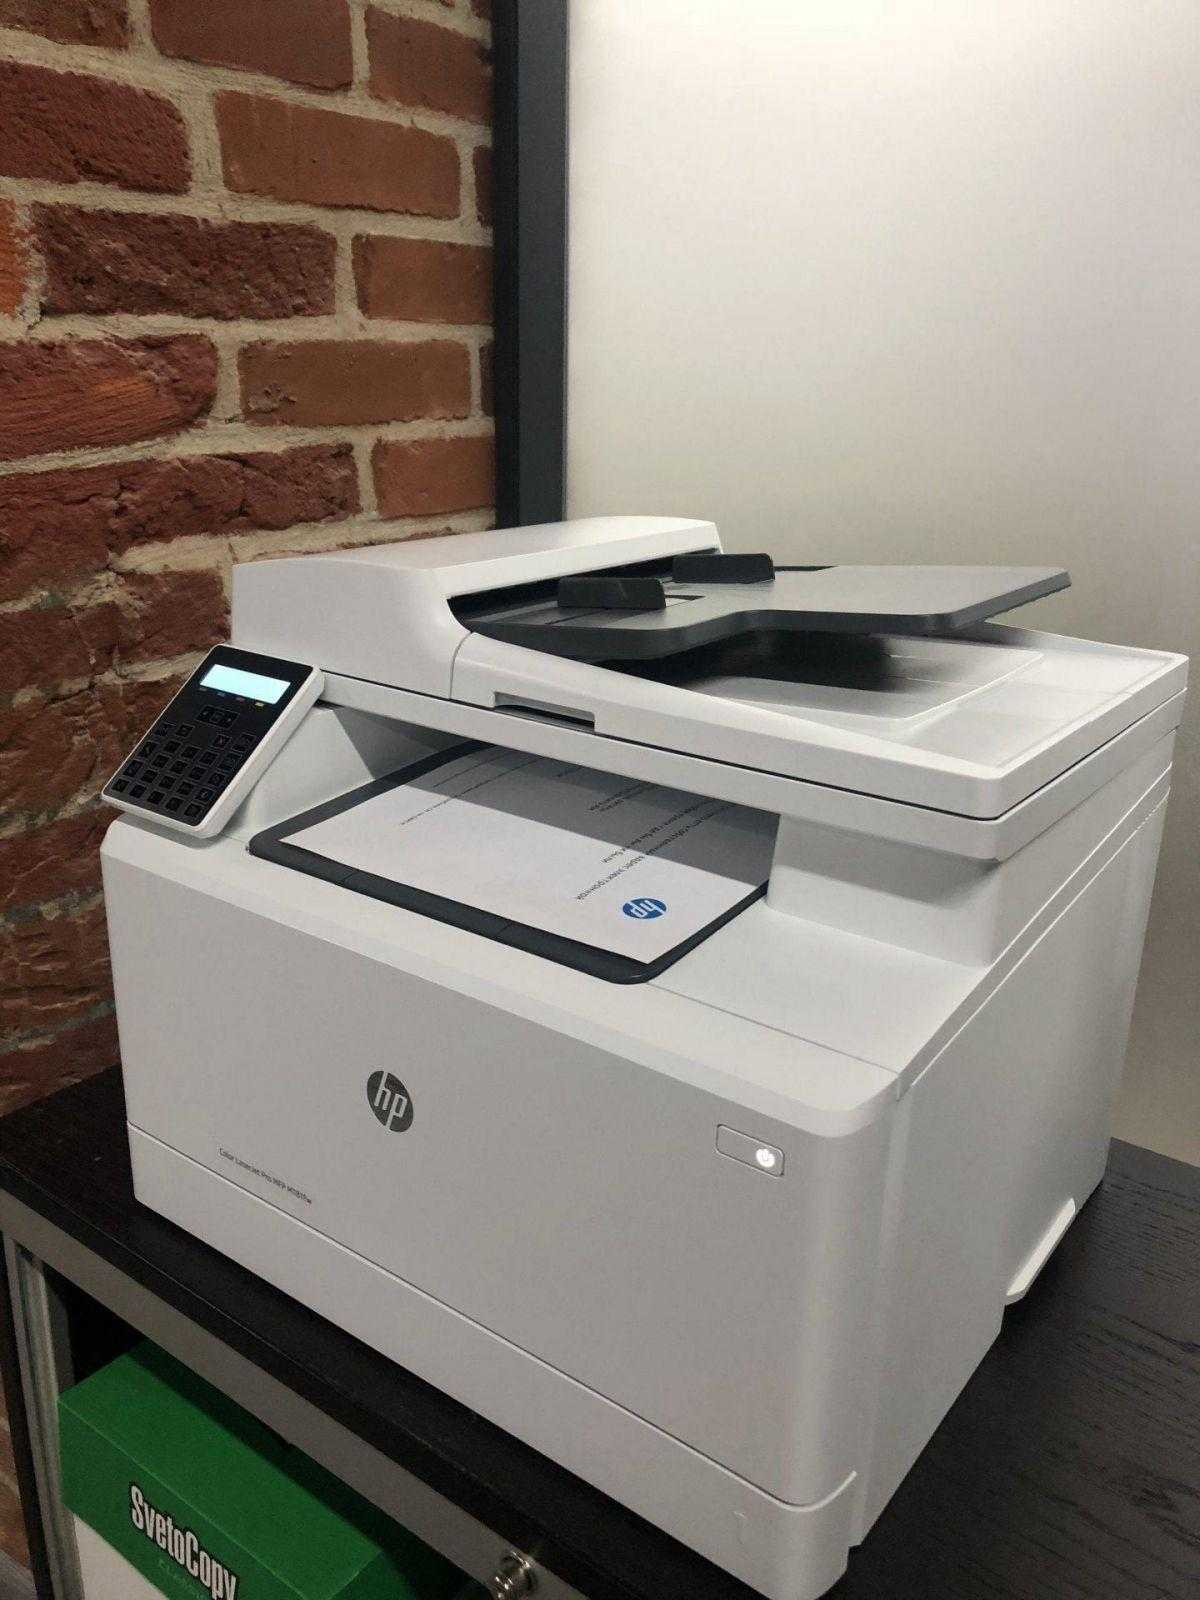 Идеален для офиса. Обзор МФУ HP Color LaserJet Pro M181fw (img 8747 1)